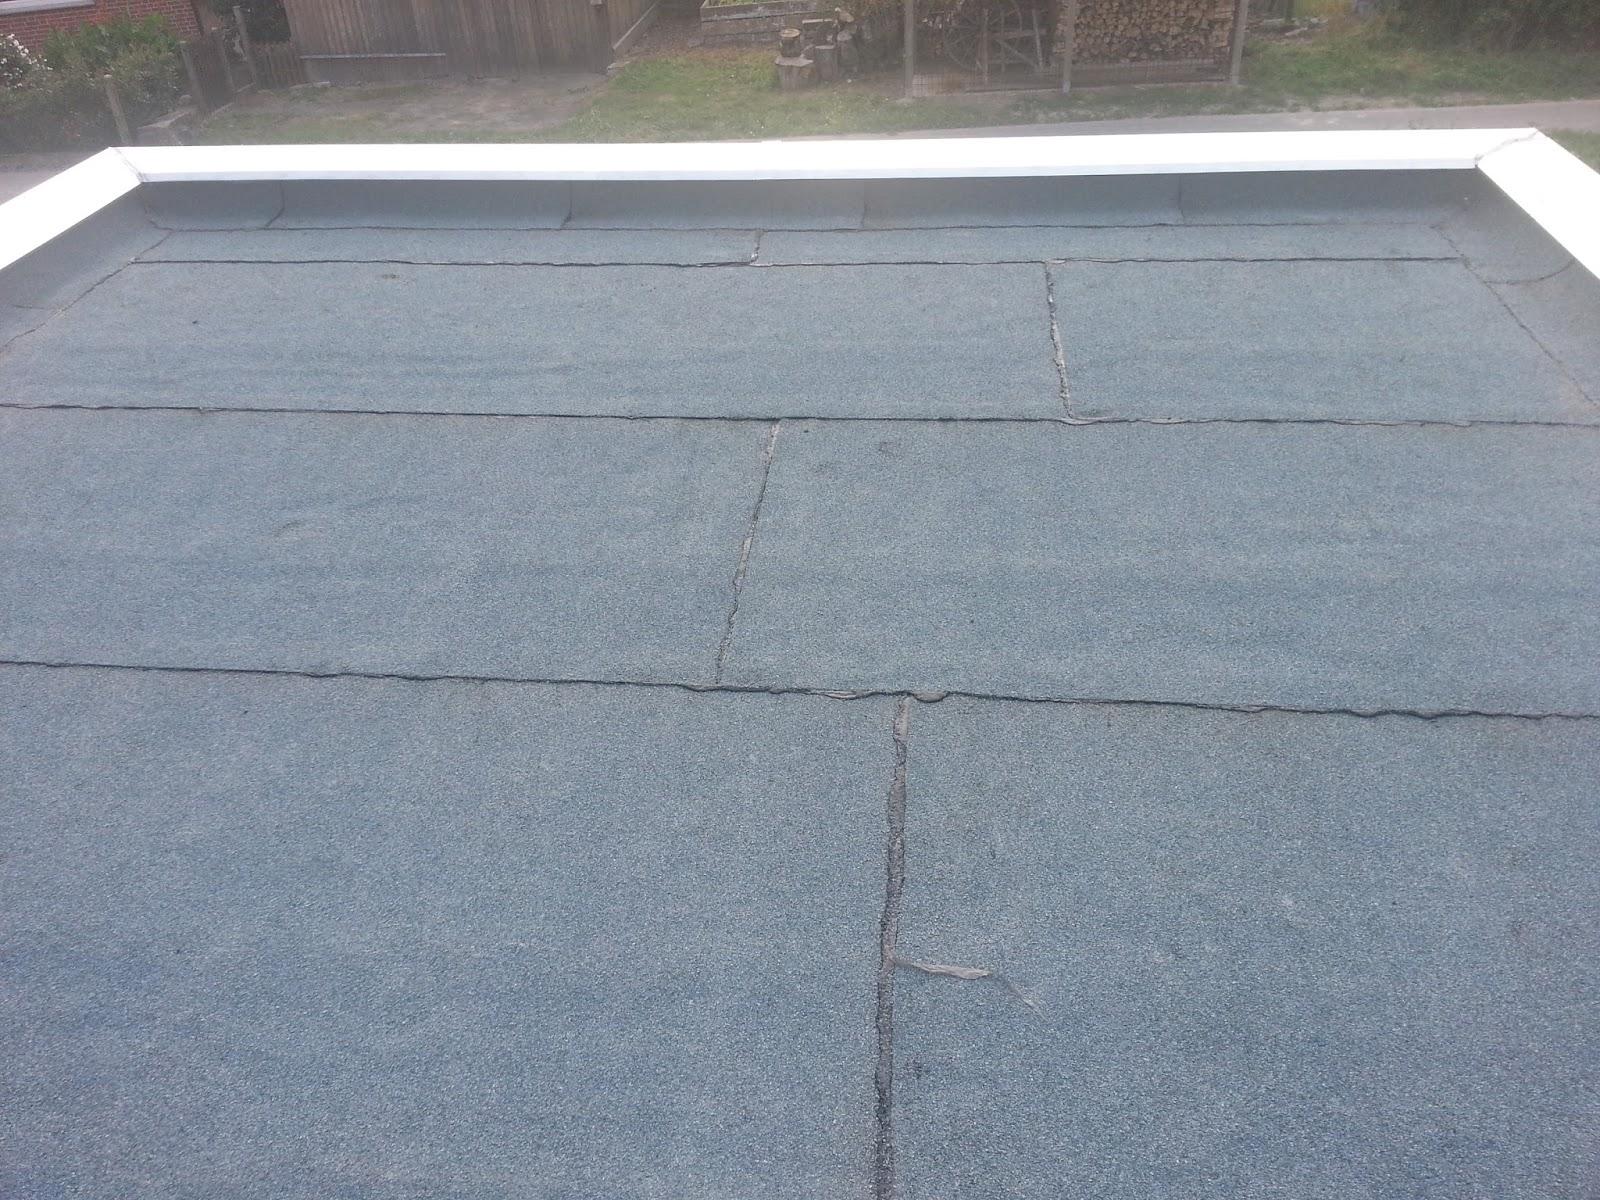 garagenboden versiegeln beton wasserdicht versiegeln beton versiegeln 2k garagenboden. Black Bedroom Furniture Sets. Home Design Ideas